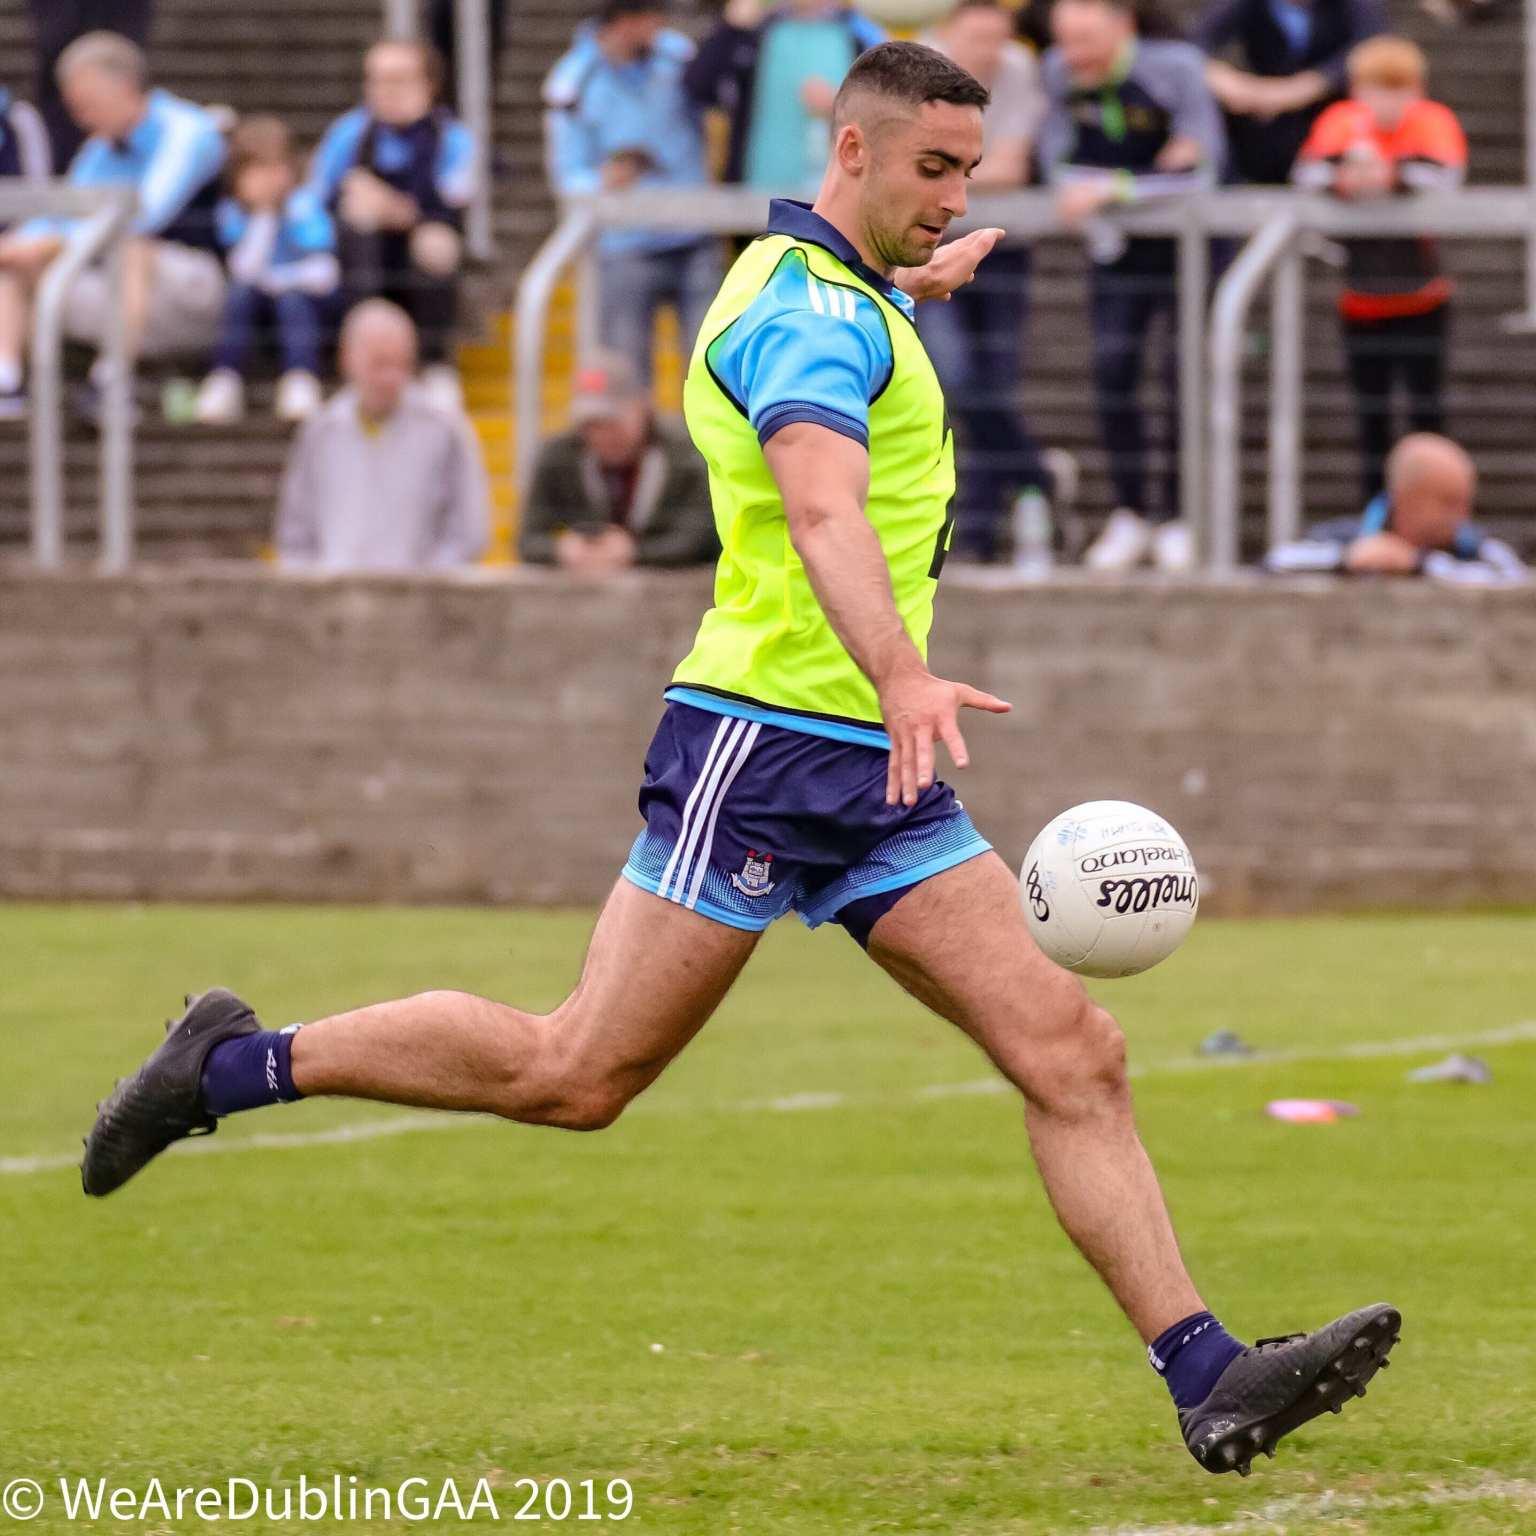 Dublin footballer James McCarthy who scored the winning goal in last year's Tyrone v Dublin game in Healy Park